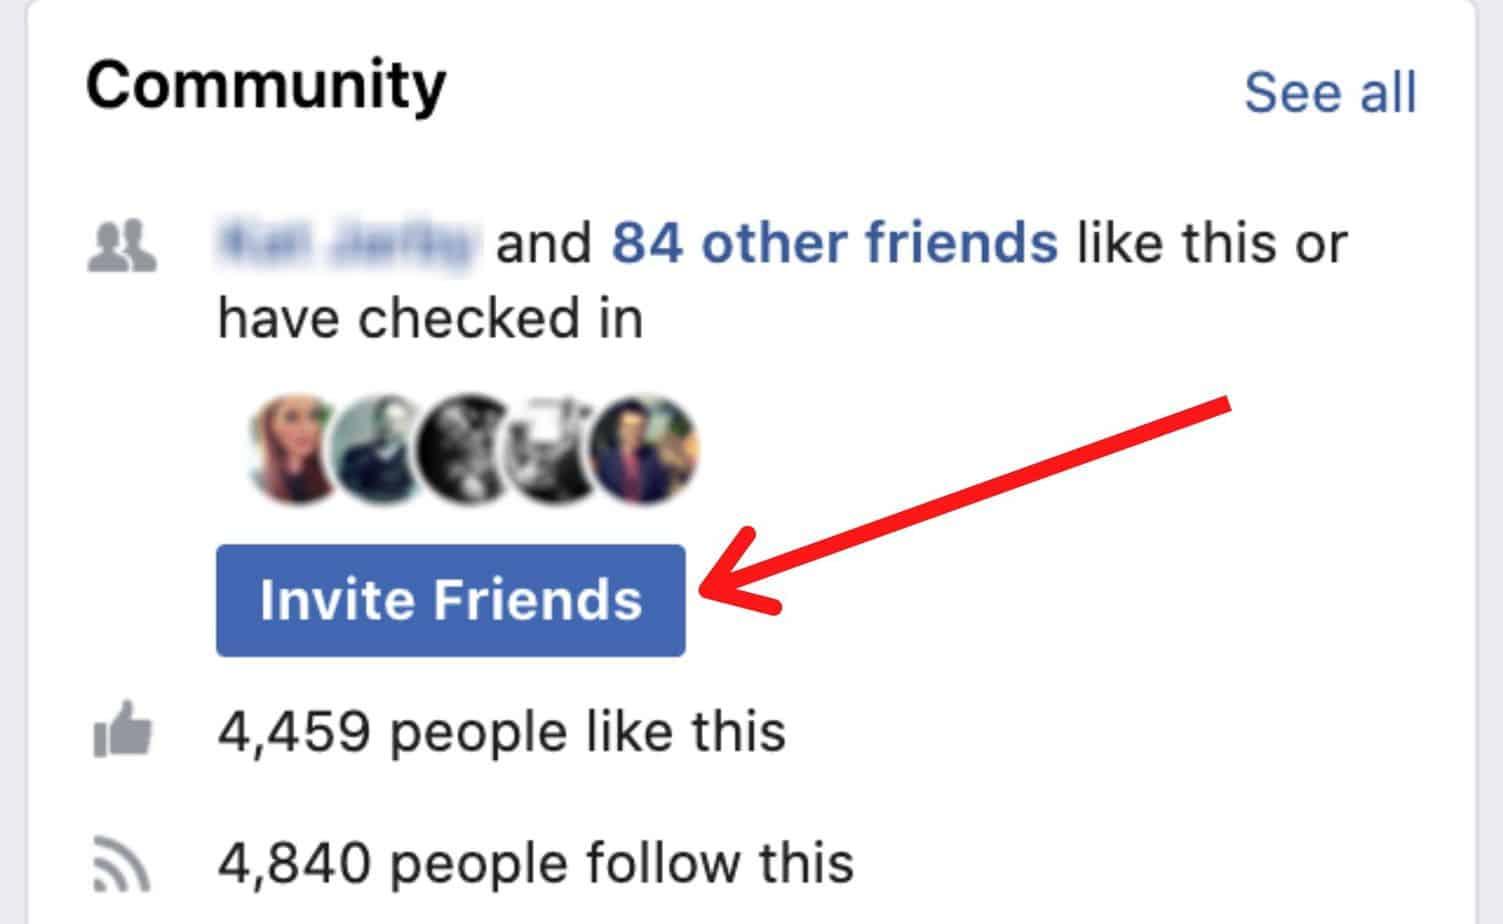 Invite friends on Facebook